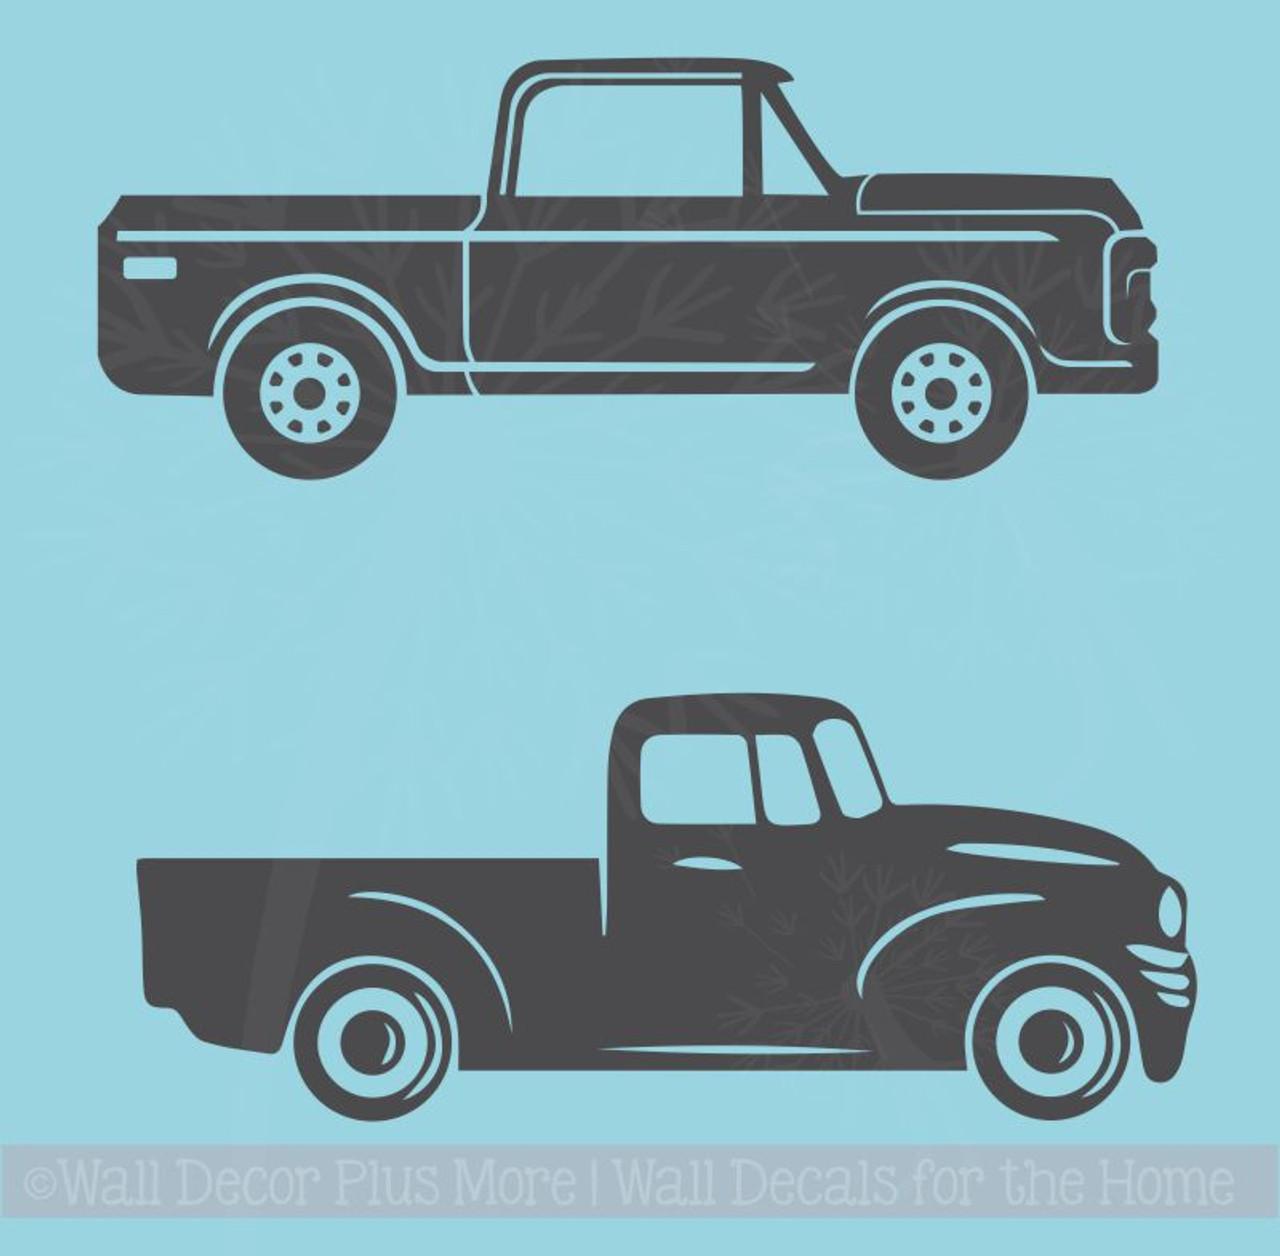 2 antique vintage trucks vinyl art stickers old pickup wall decals